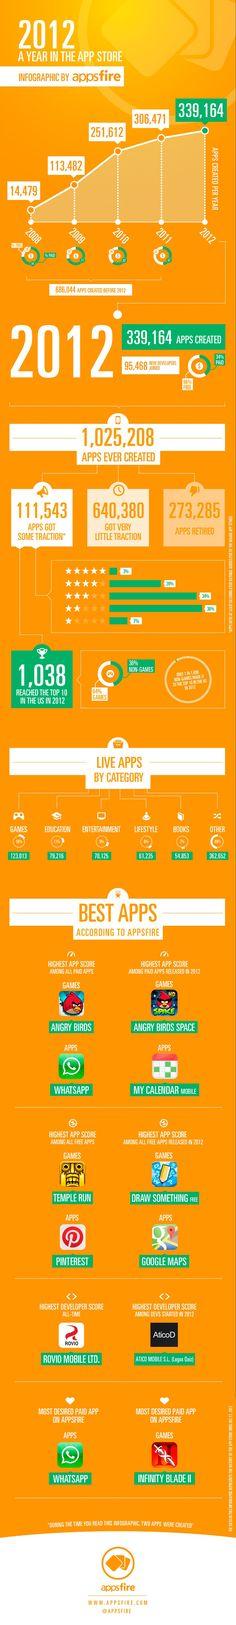 Appsfire  App Store data 2012